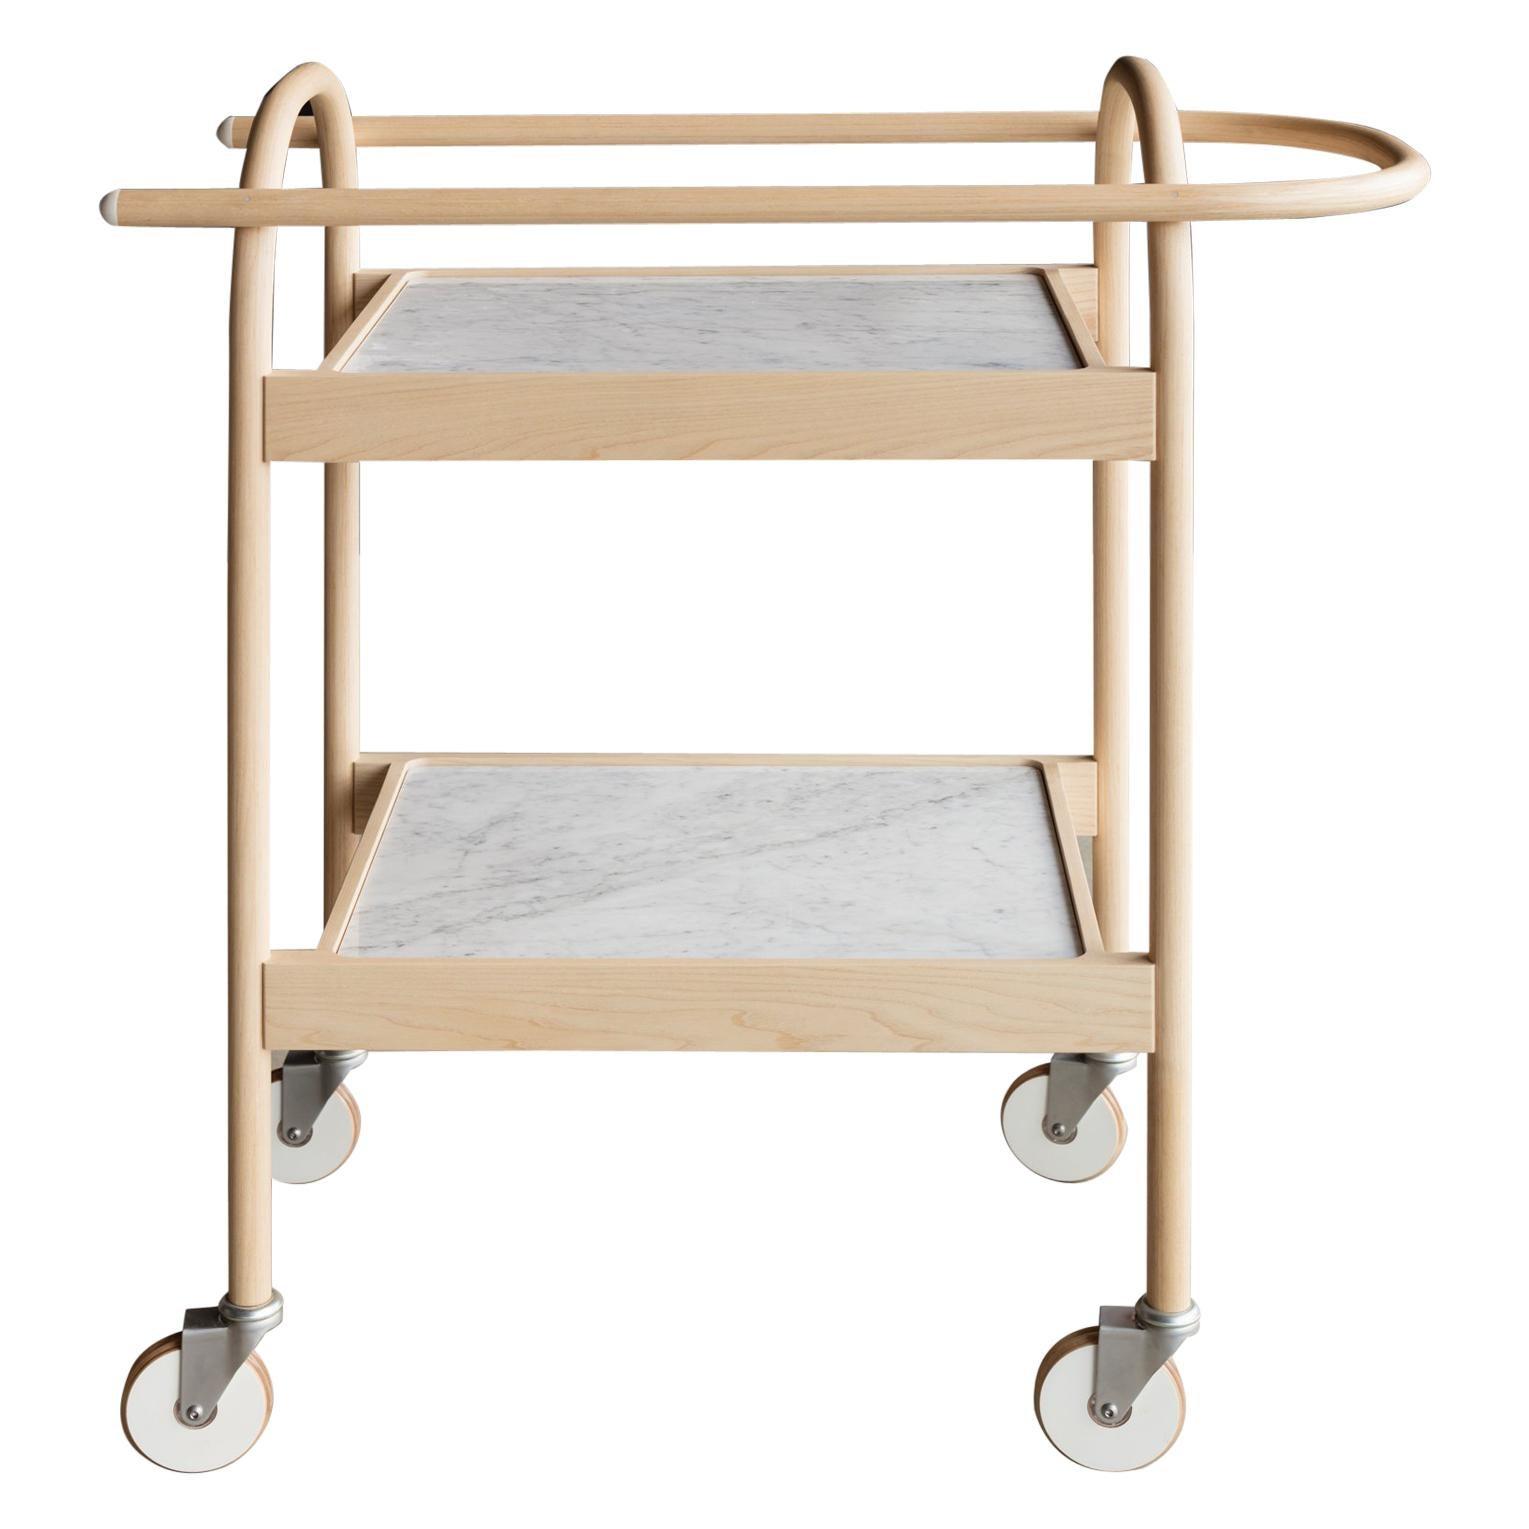 U3 Serving Trolley/ Bar Cart in Solid Wood and Carrara Marble by Bowen Liu